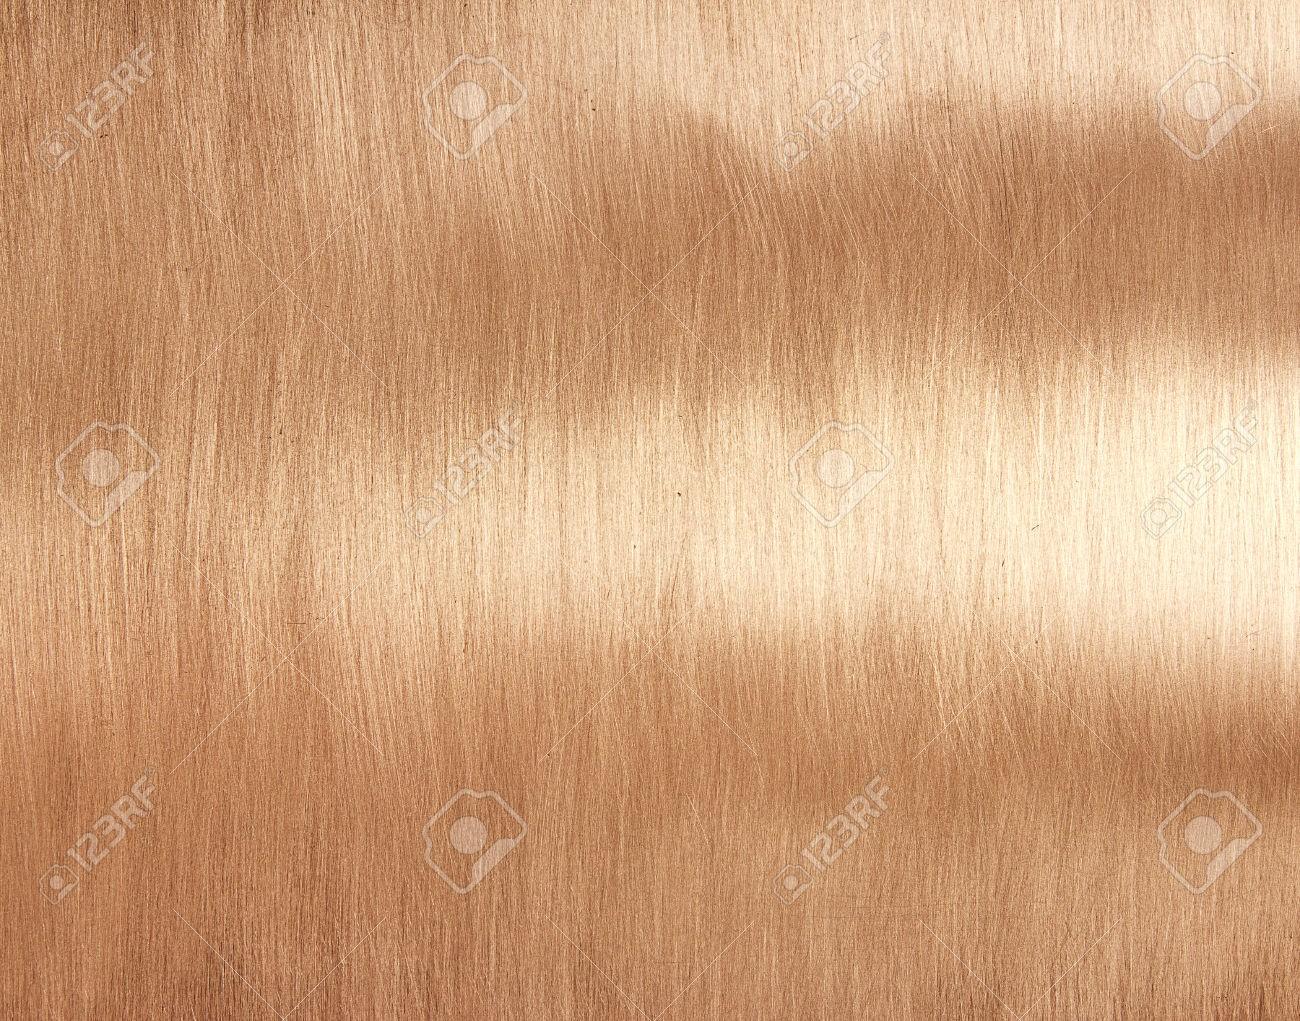 Cobre Cepillado